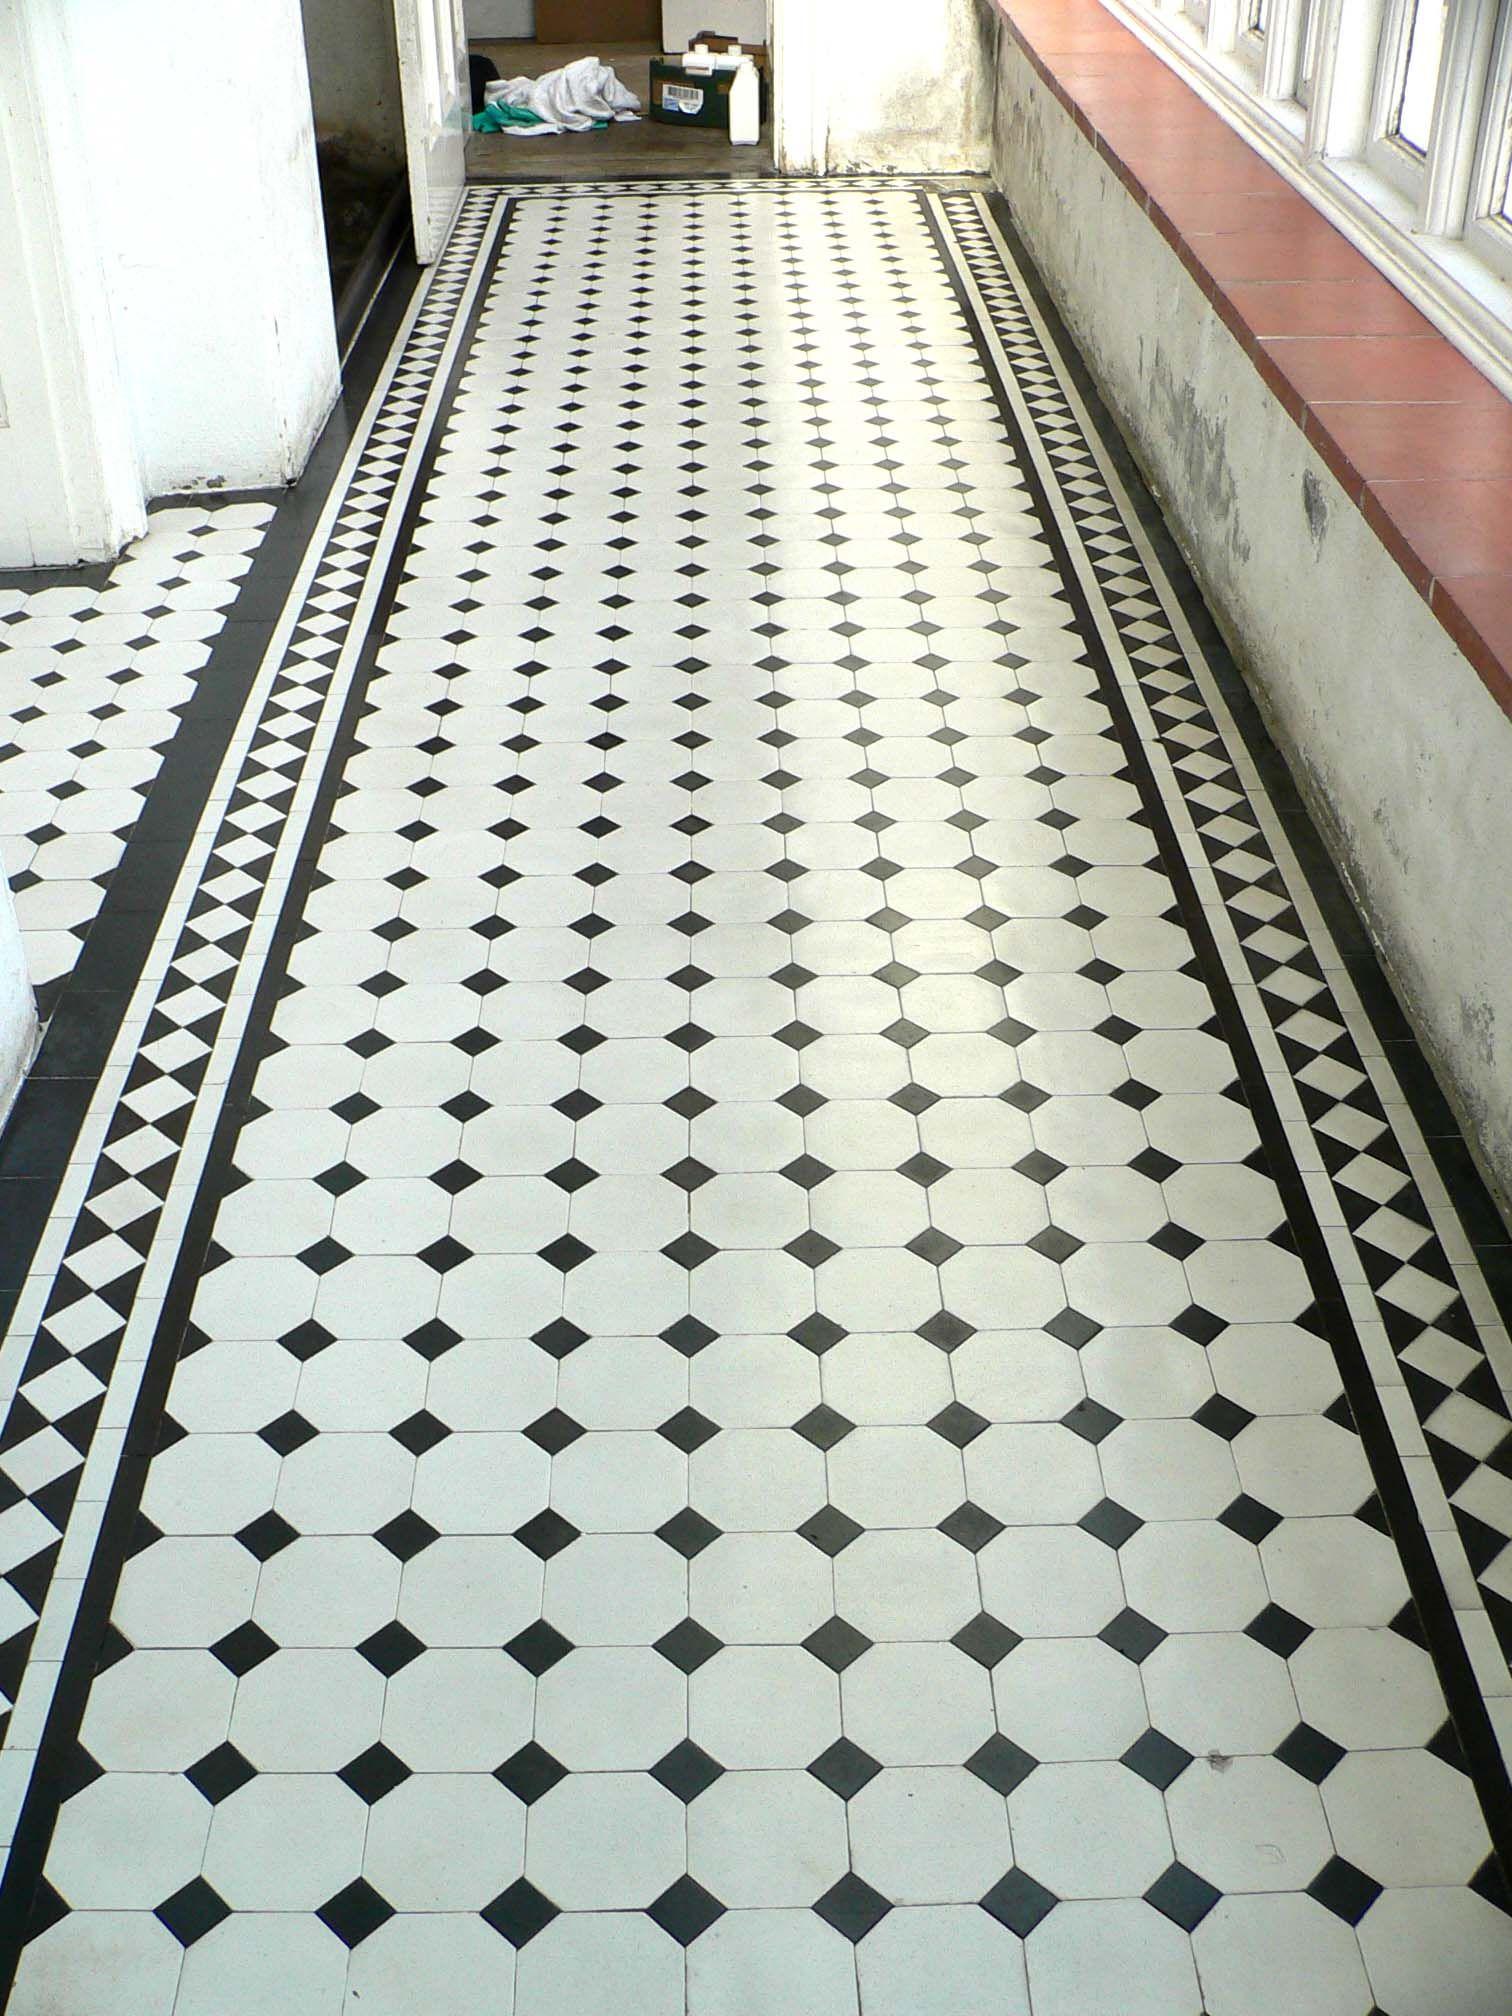 Restored victorian conservatory floor garden tile pinterest restored victorian conservatory floor dailygadgetfo Image collections